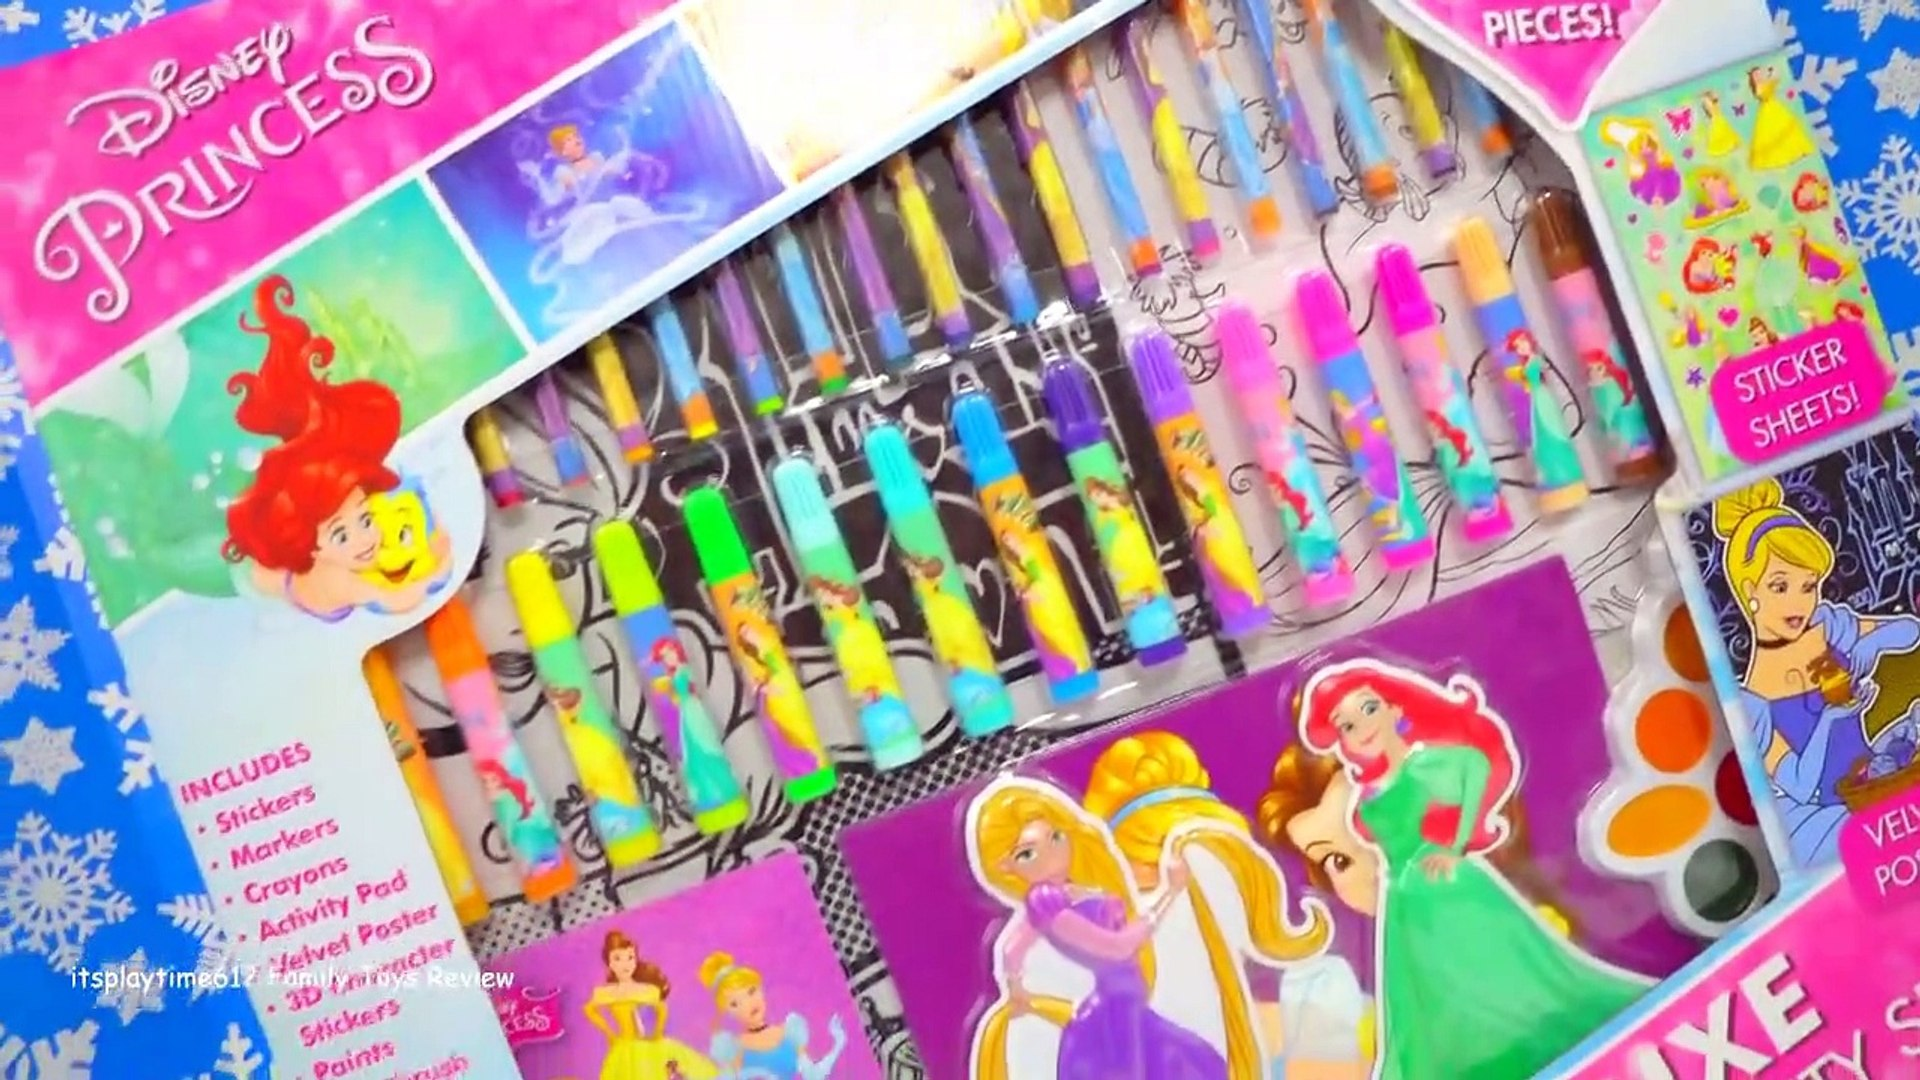 DISNEY PRINCESS Color & Activity Set Creativity for Kids _ itsplayt